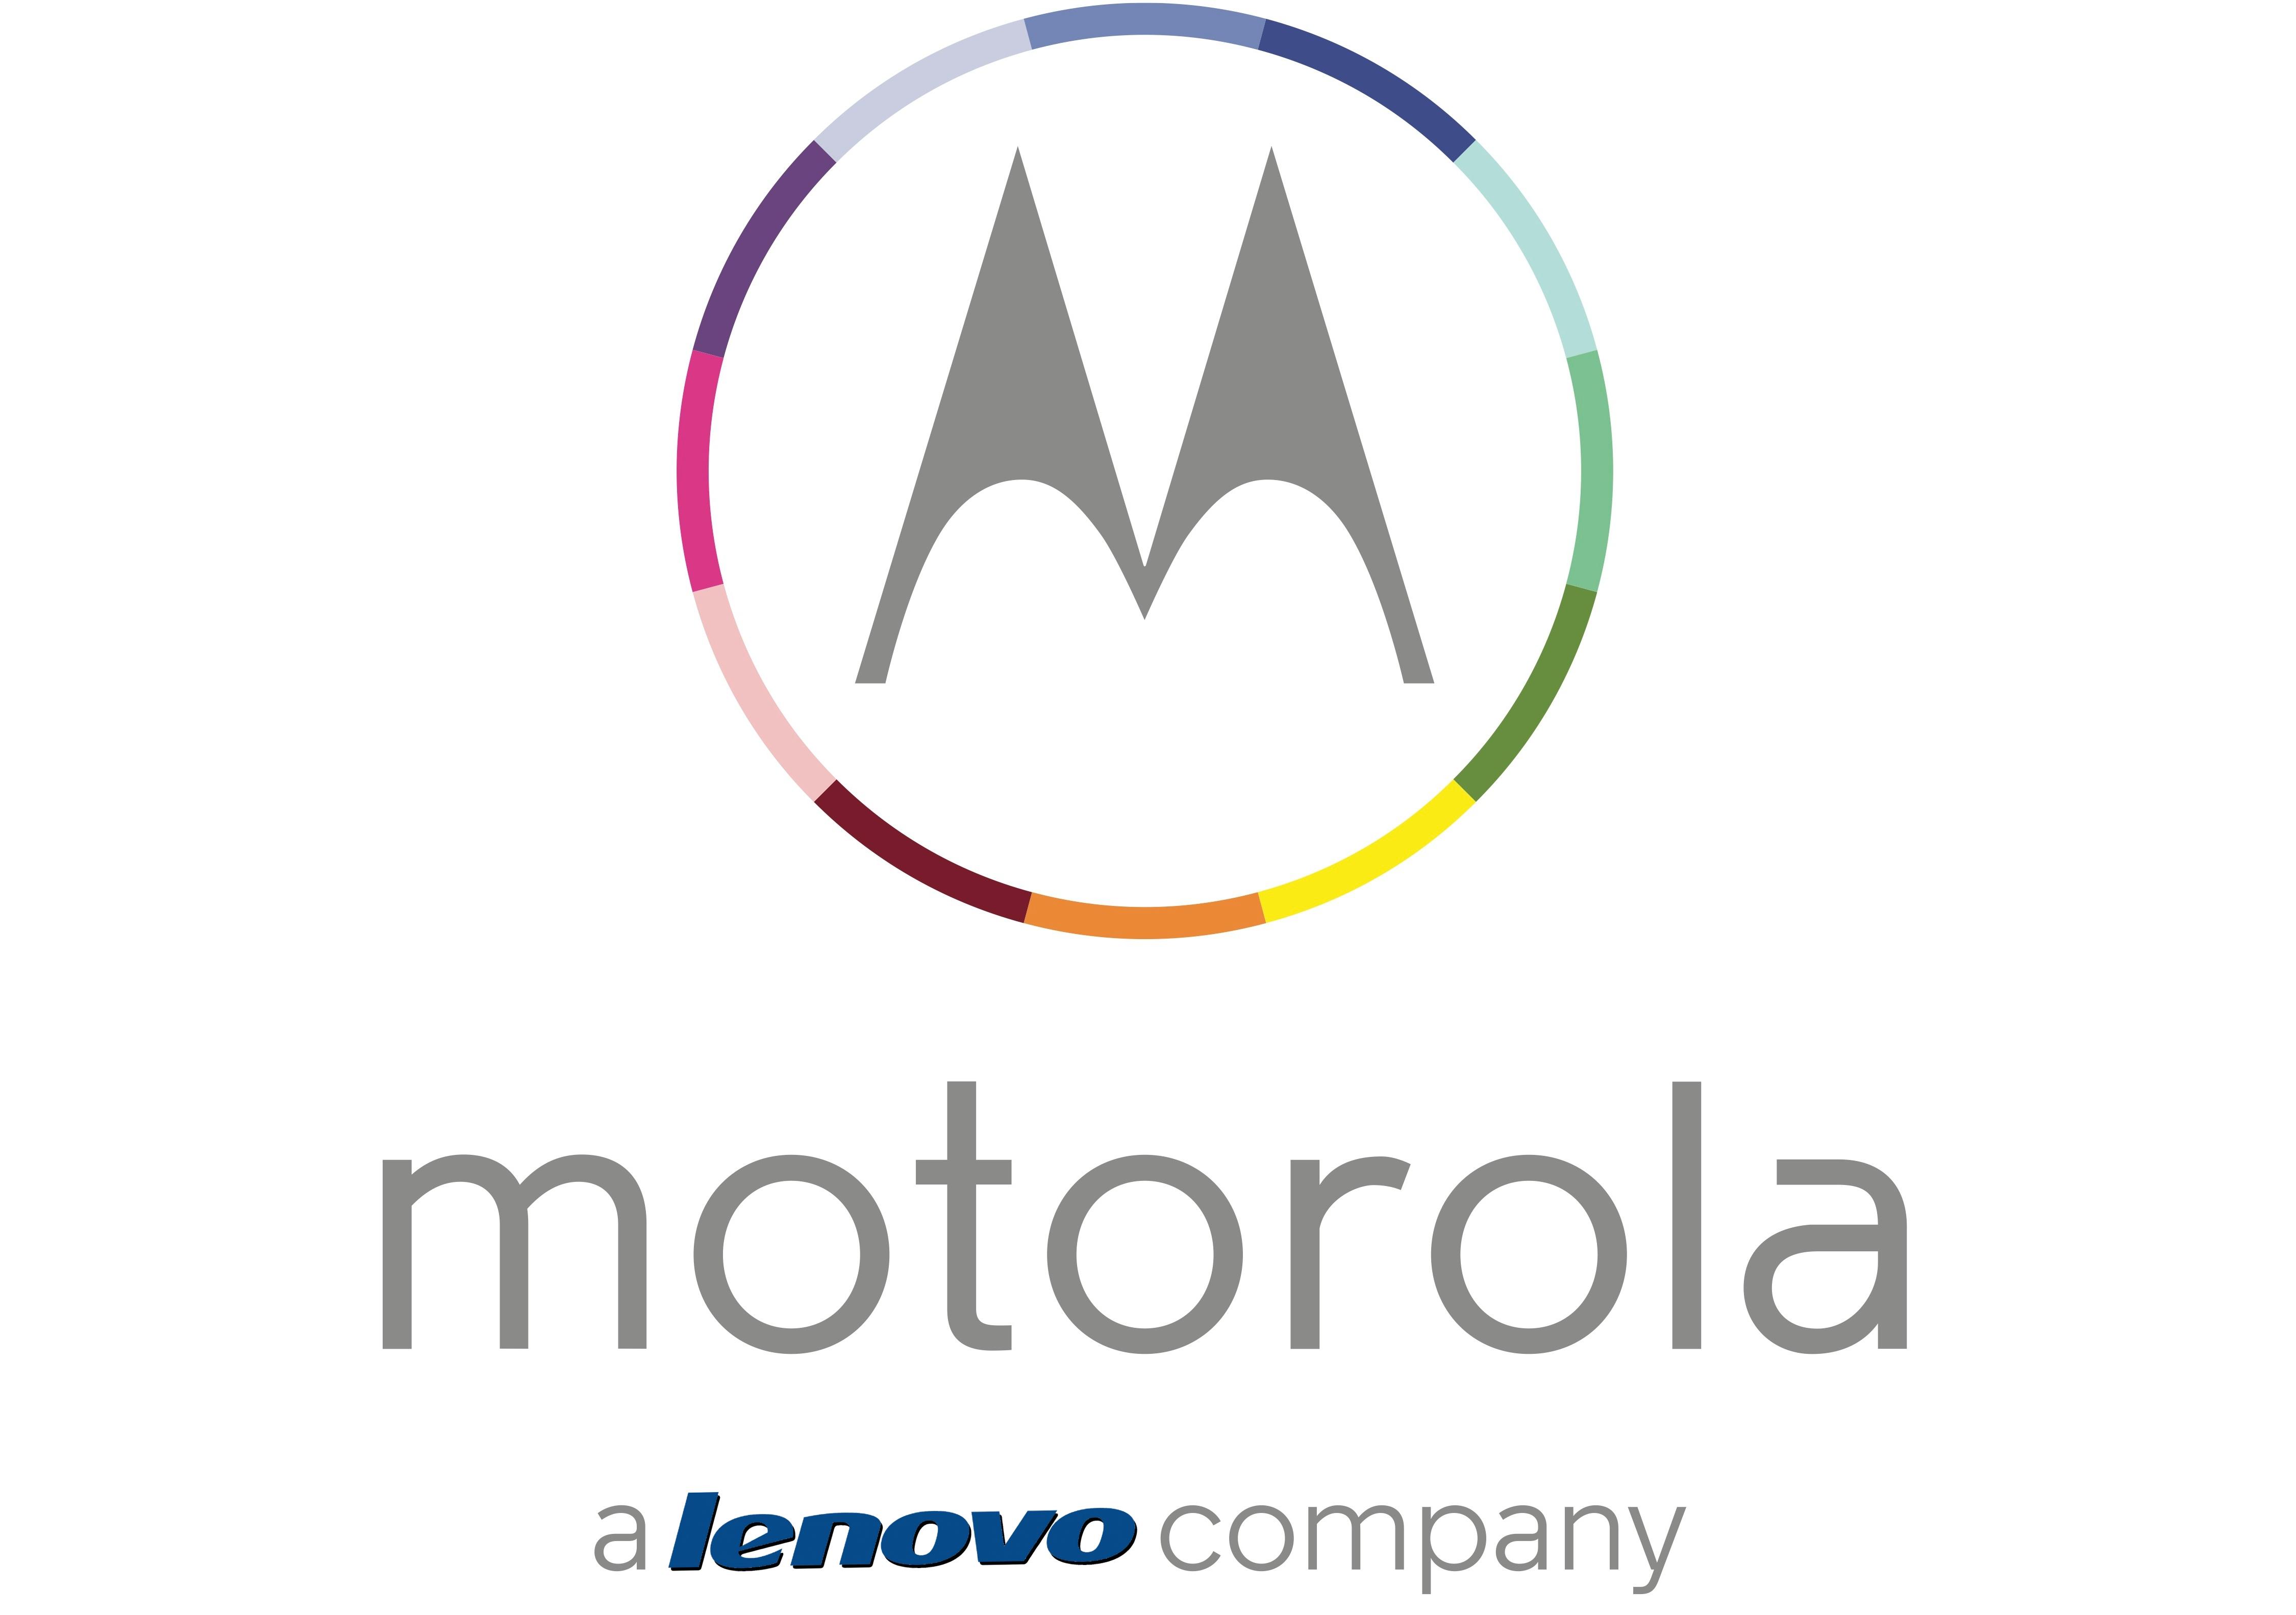 motorola archives vr world vr world